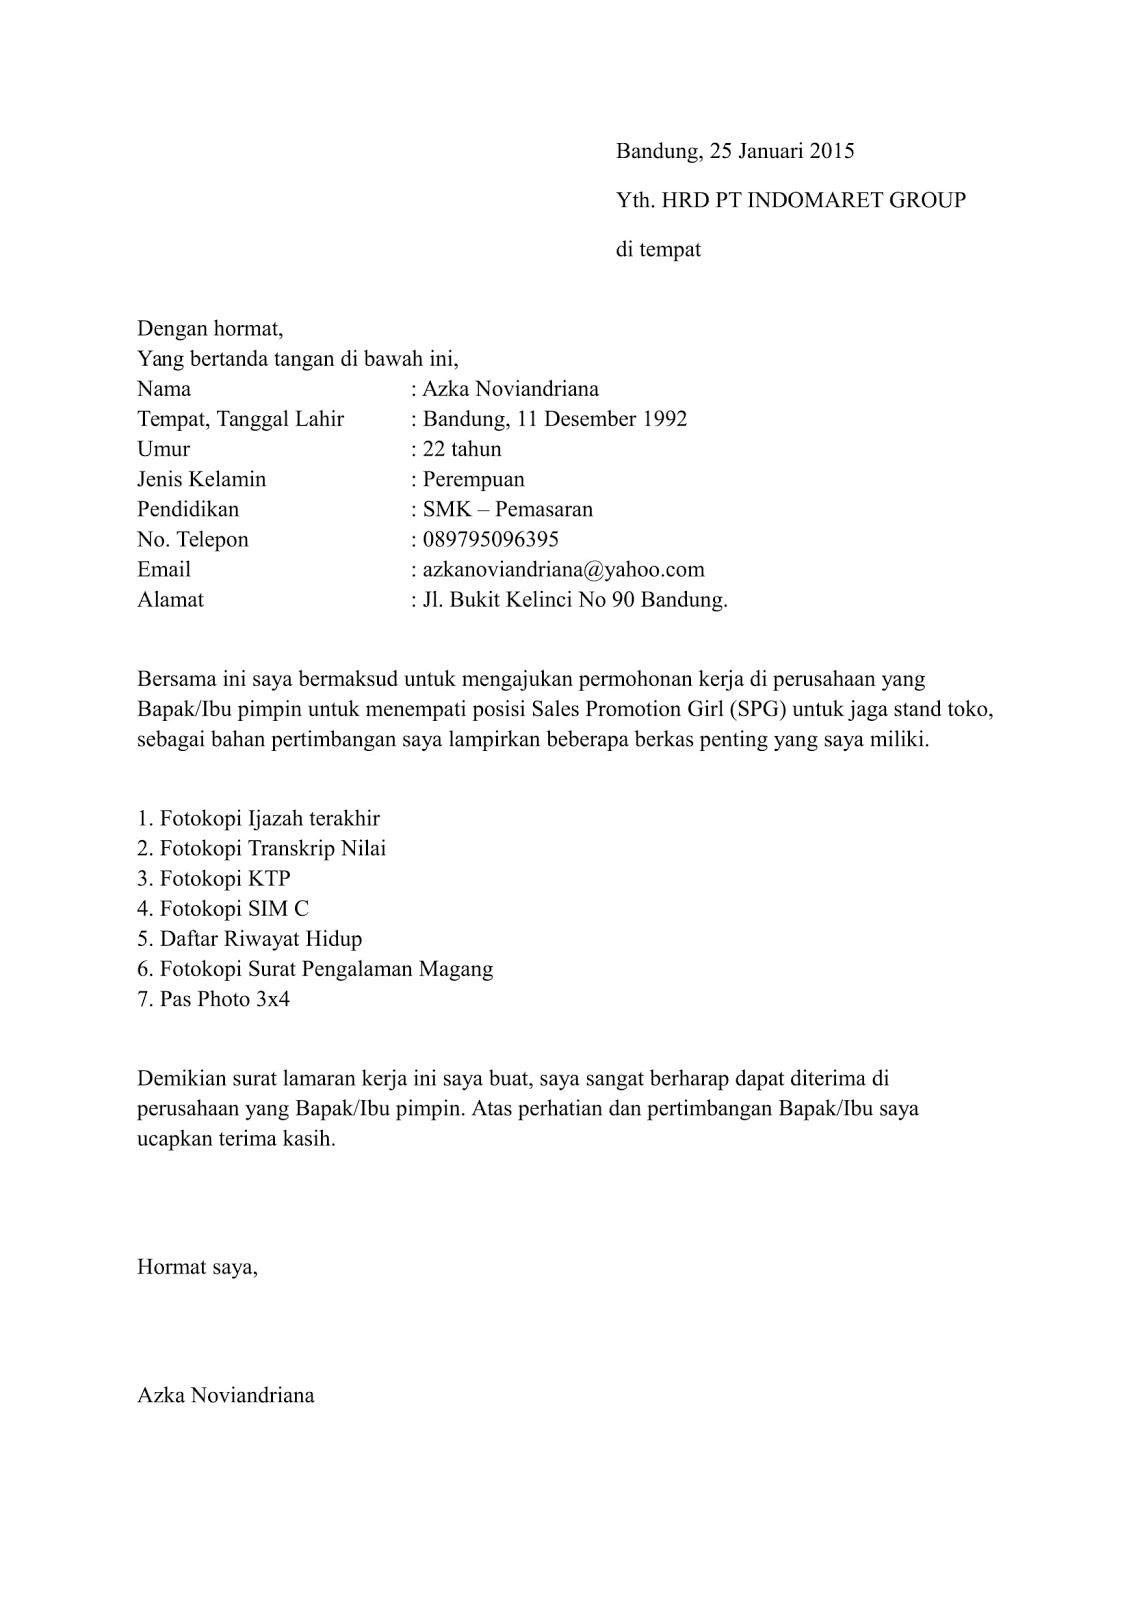 30 Contoh Surat Lamaran Kerja Terbaru Berbagai Pekerjaan